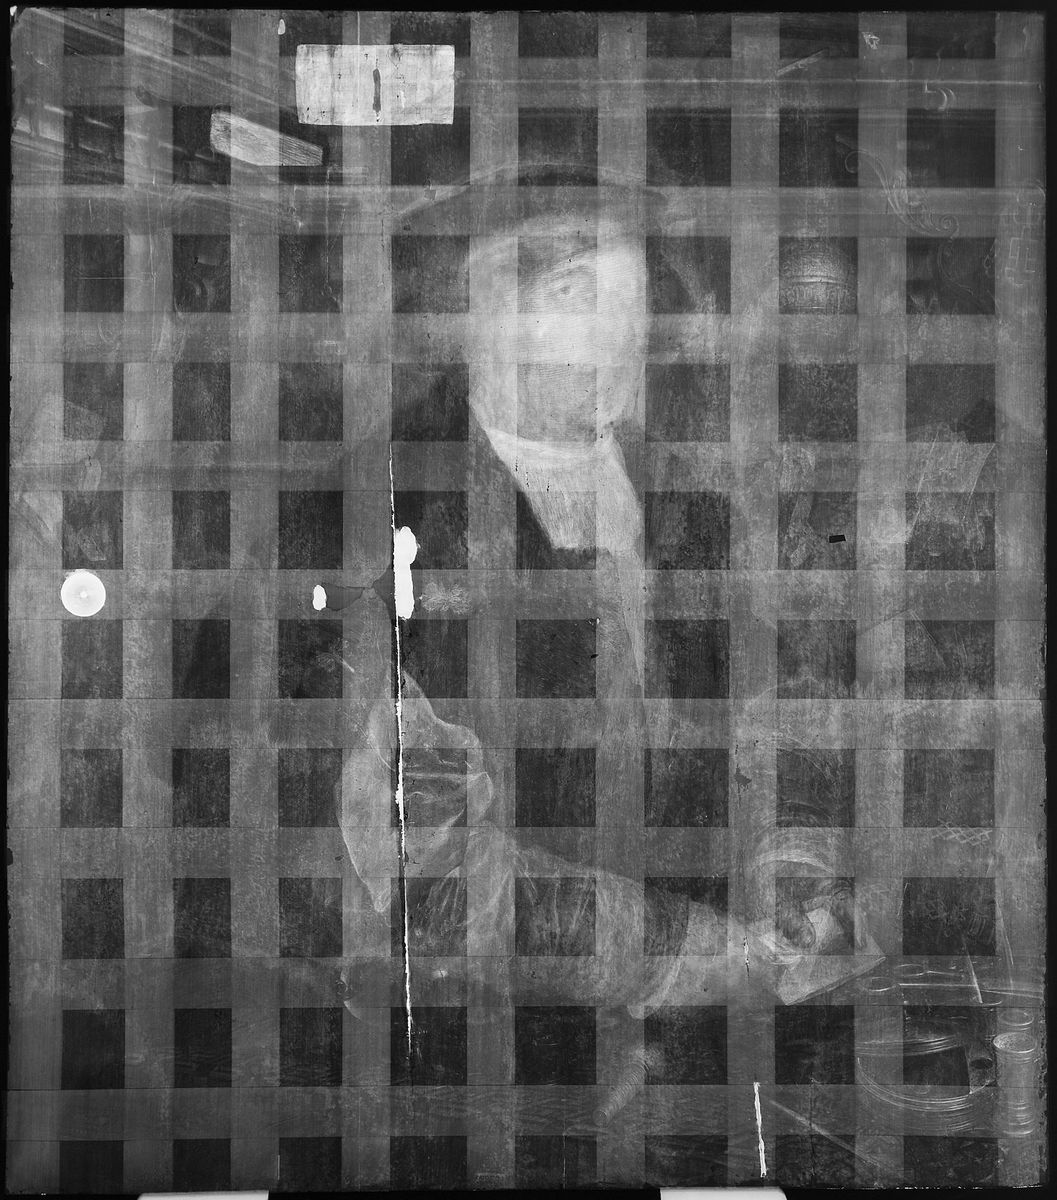 Radiografie des Kaufmanns Georg Gisze, Gemäldegalerie © SMB, Christoph Schmidt